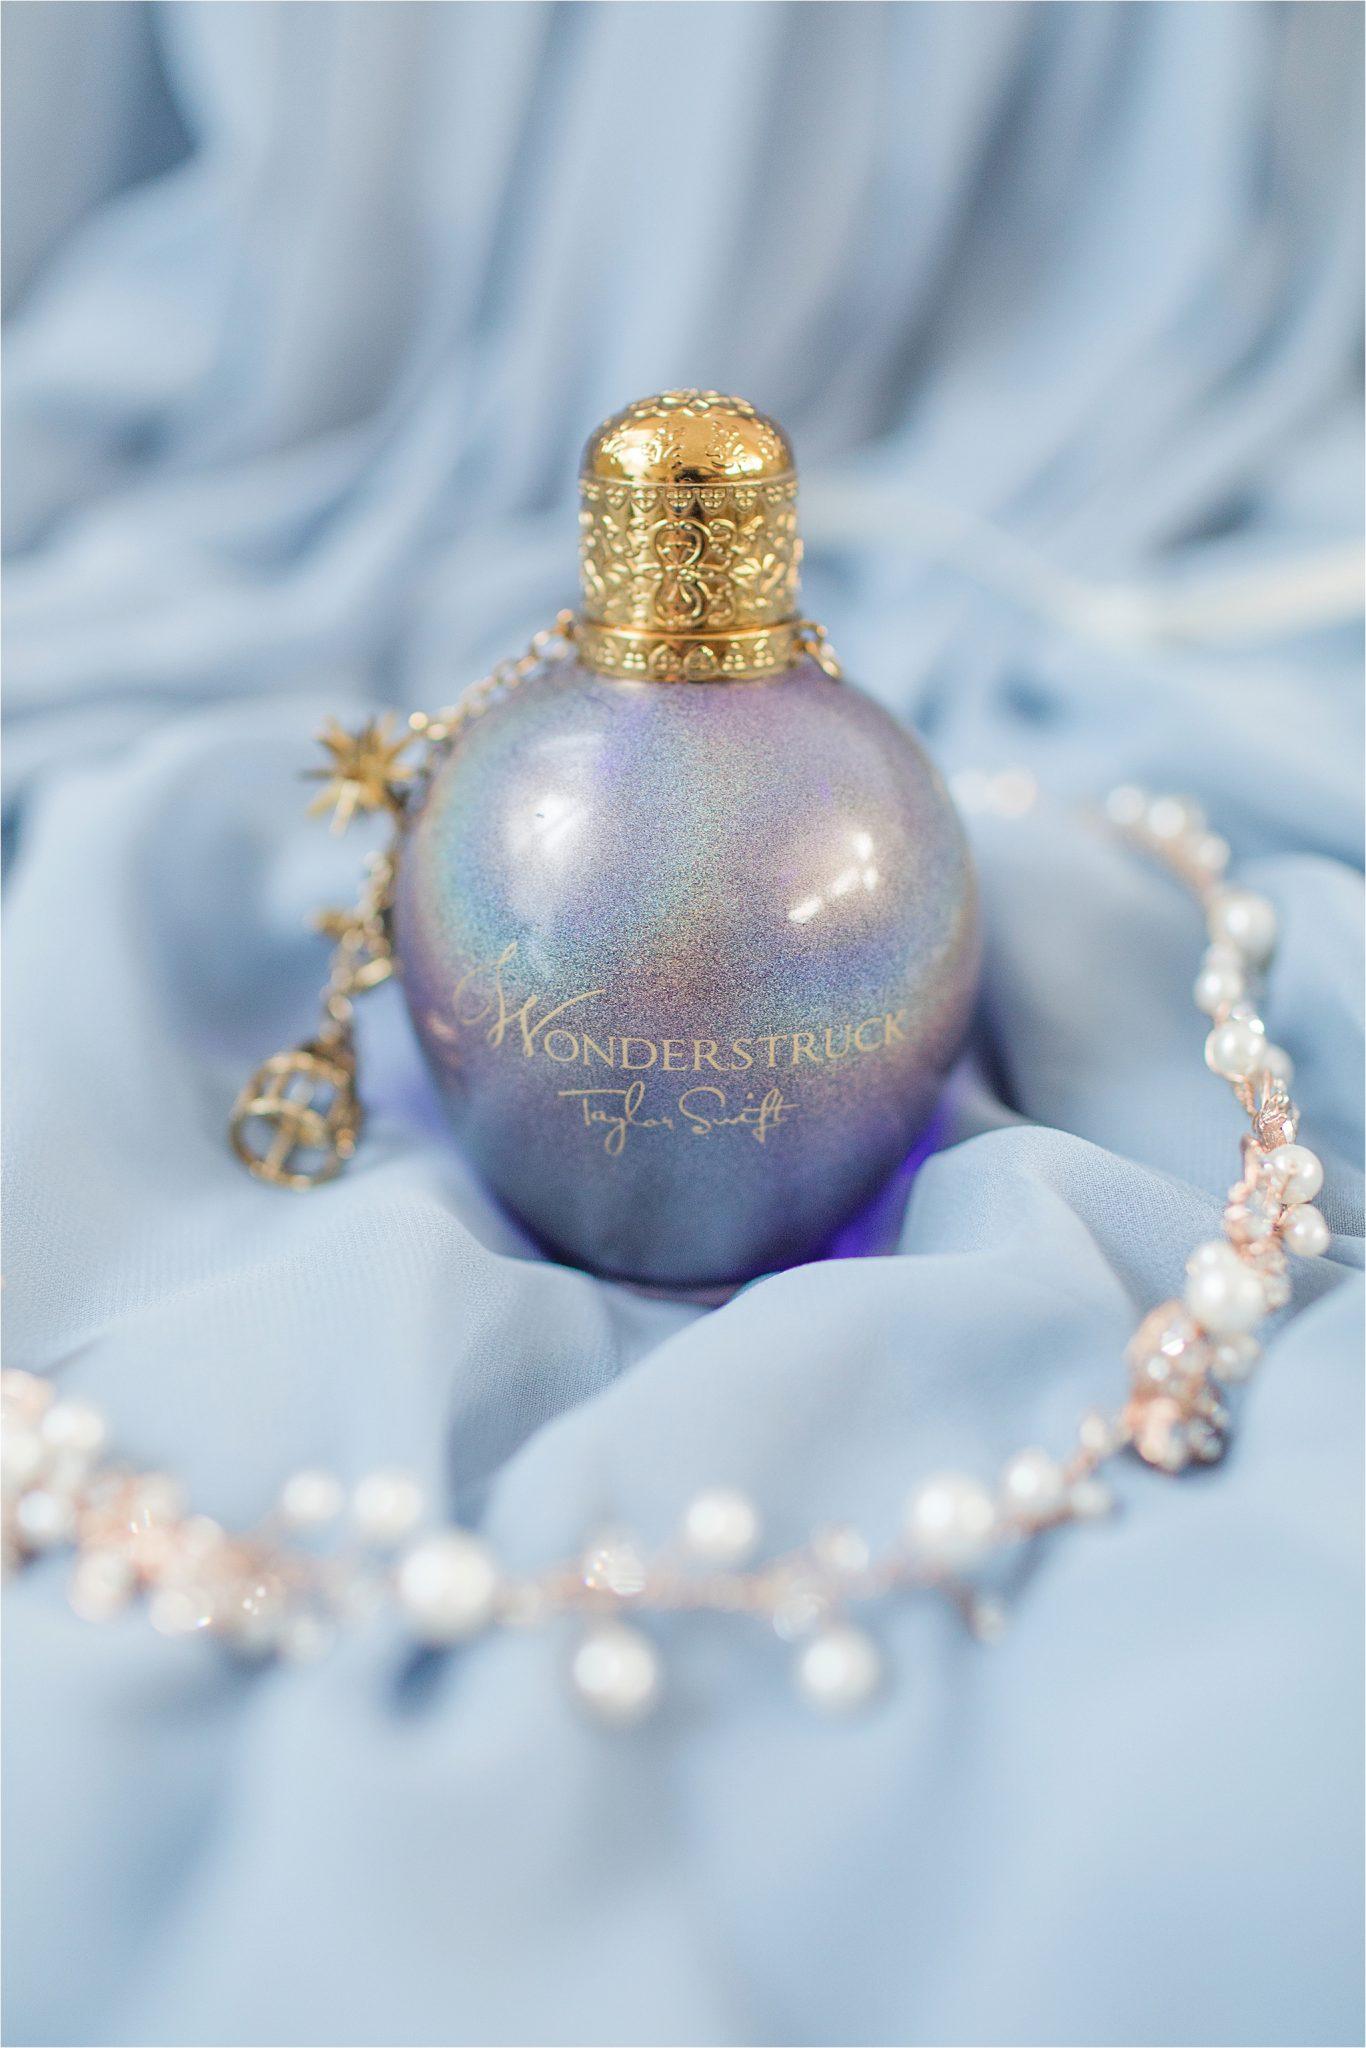 taylor-swift-wonderstruck-perfume-bottle-bridal-details